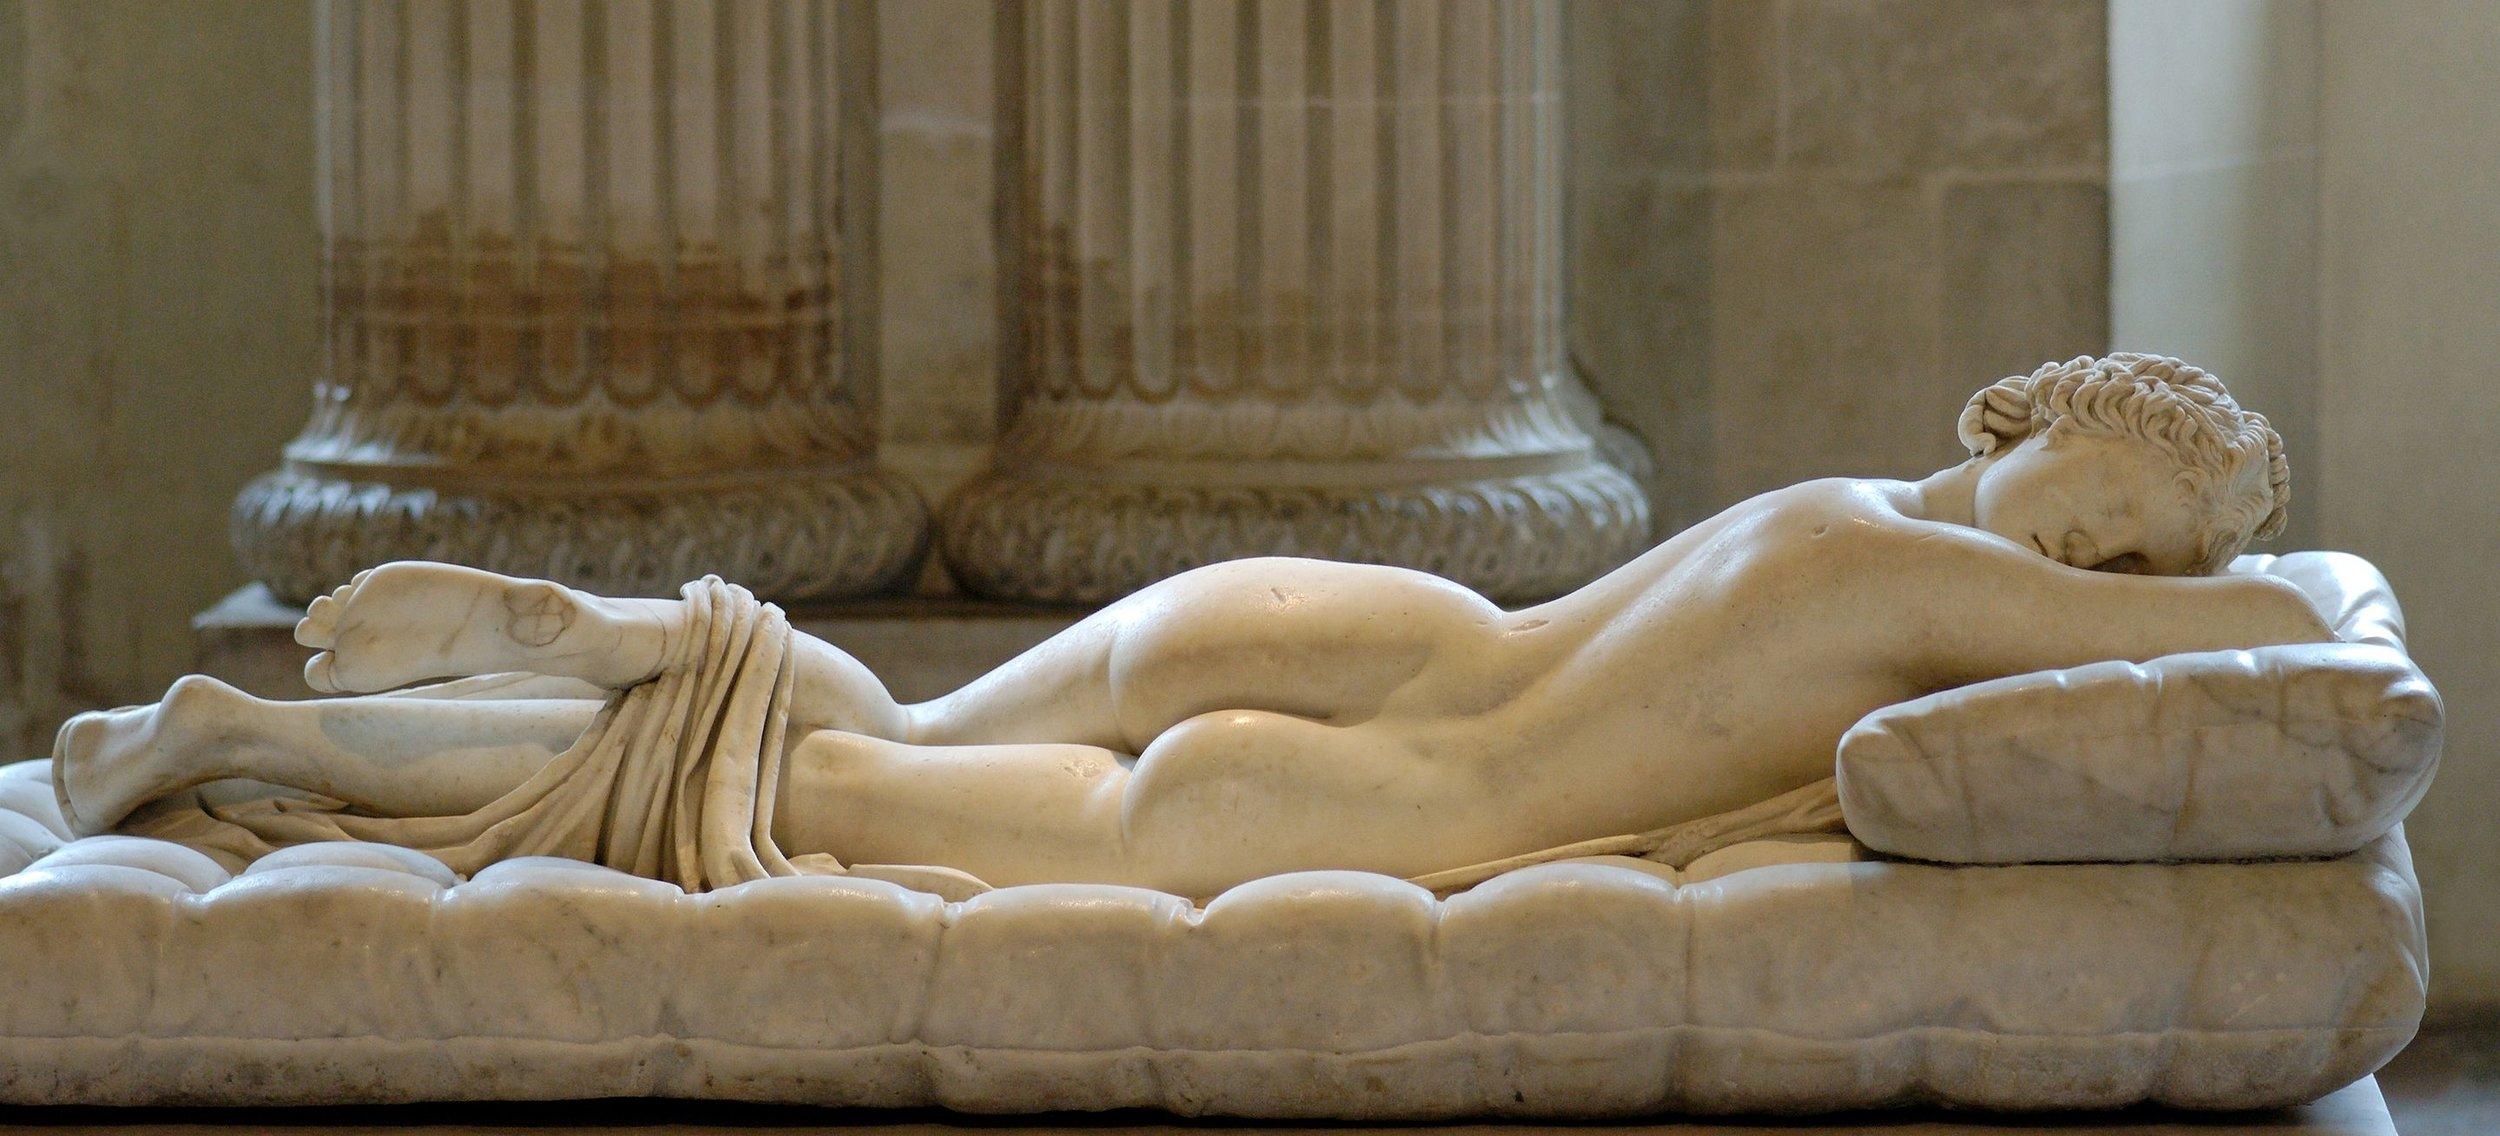 Borghese Hermaphrodite  , an ancient Roman copy, excavated c. 1608–20